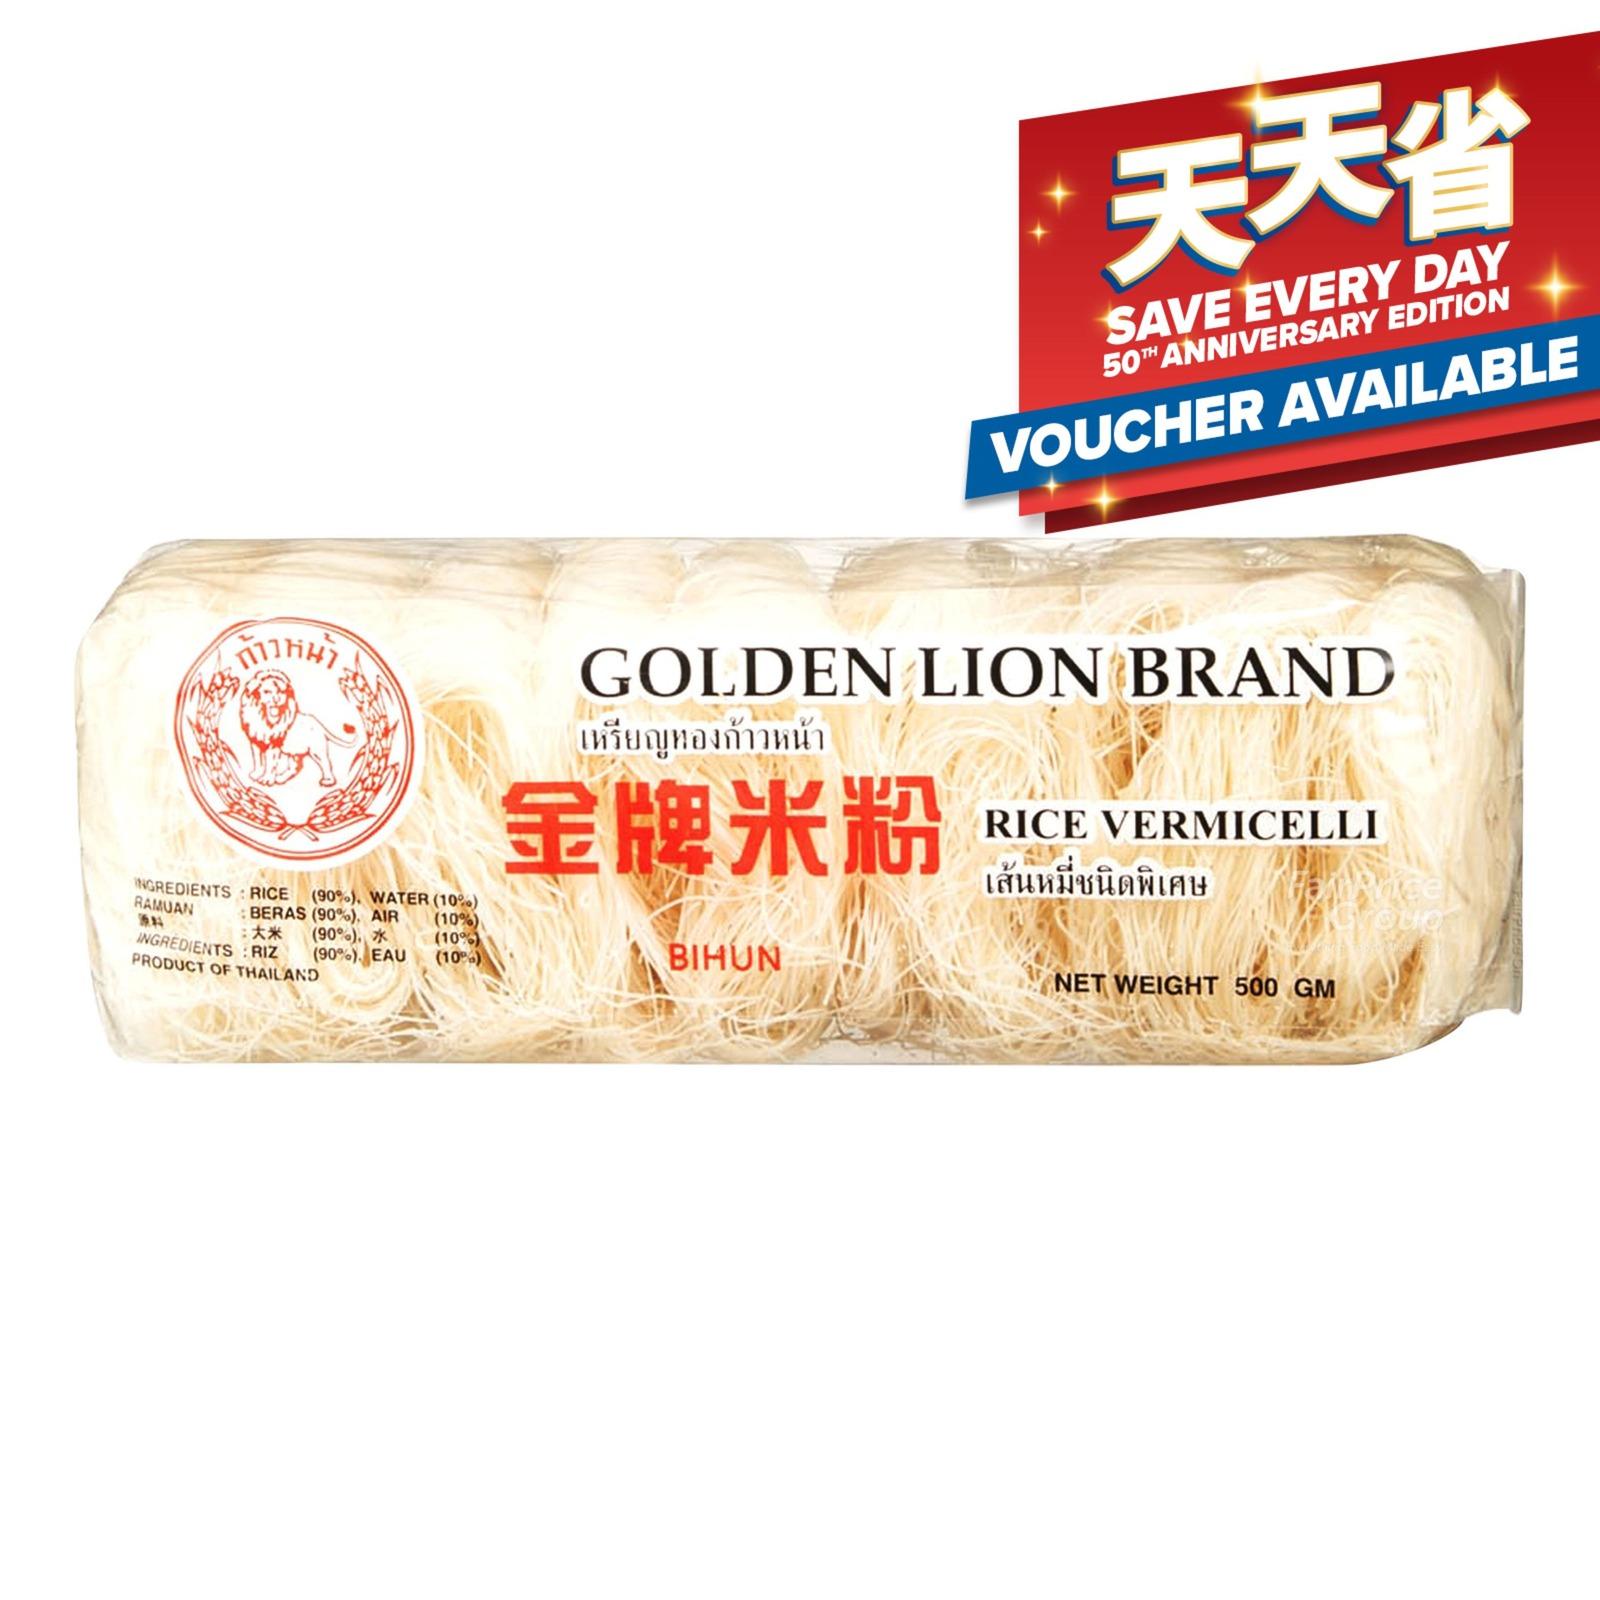 Golden Lion Brand Rice Vermicelli